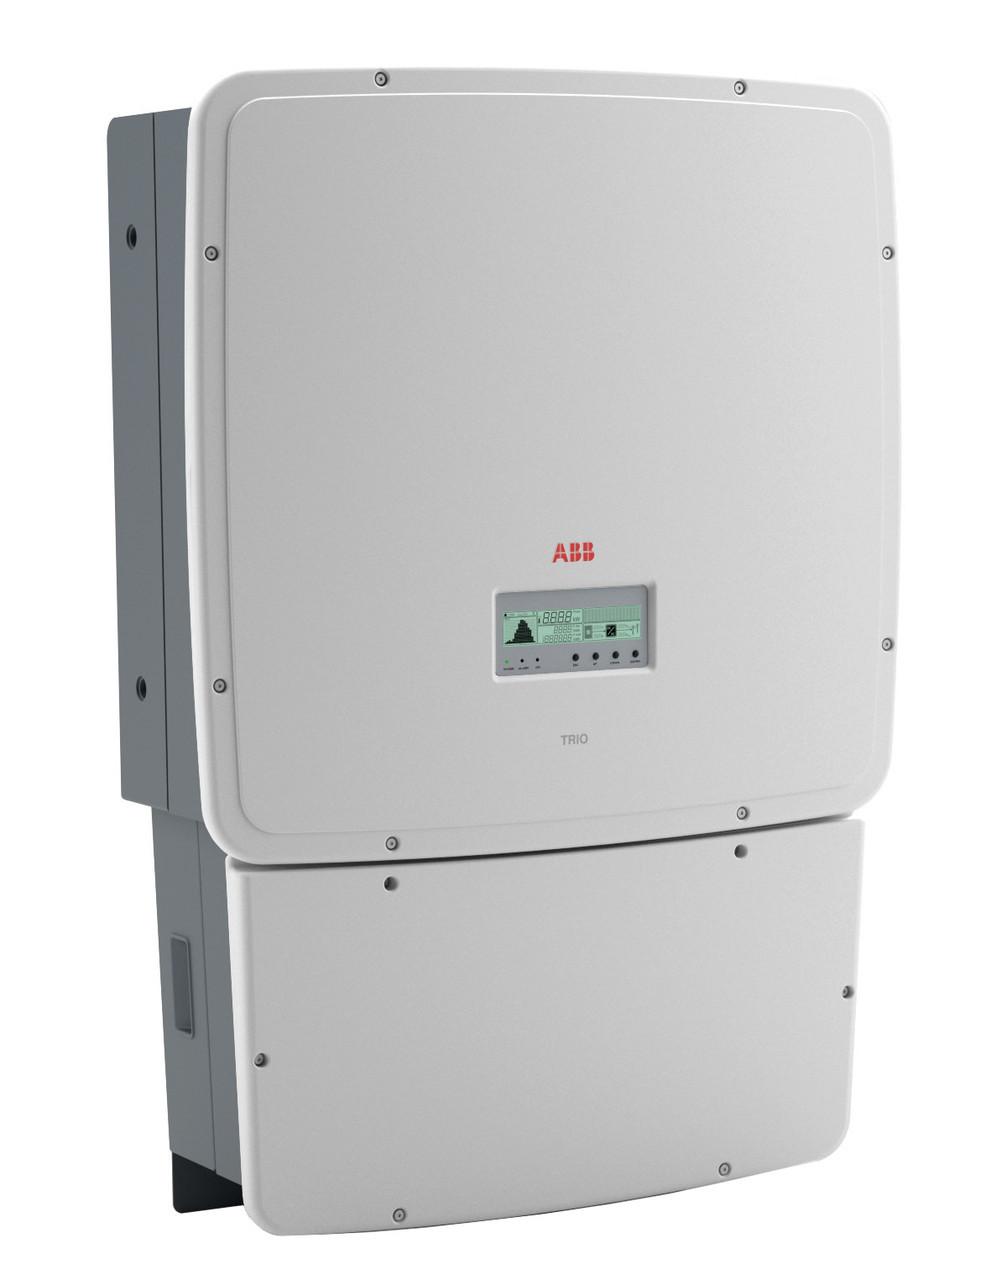 Инвертор сетевой ABB TRIO-27.6-TL-OUTD-S2-400 (27.6 кВт, 3 фазы /2 трекера)